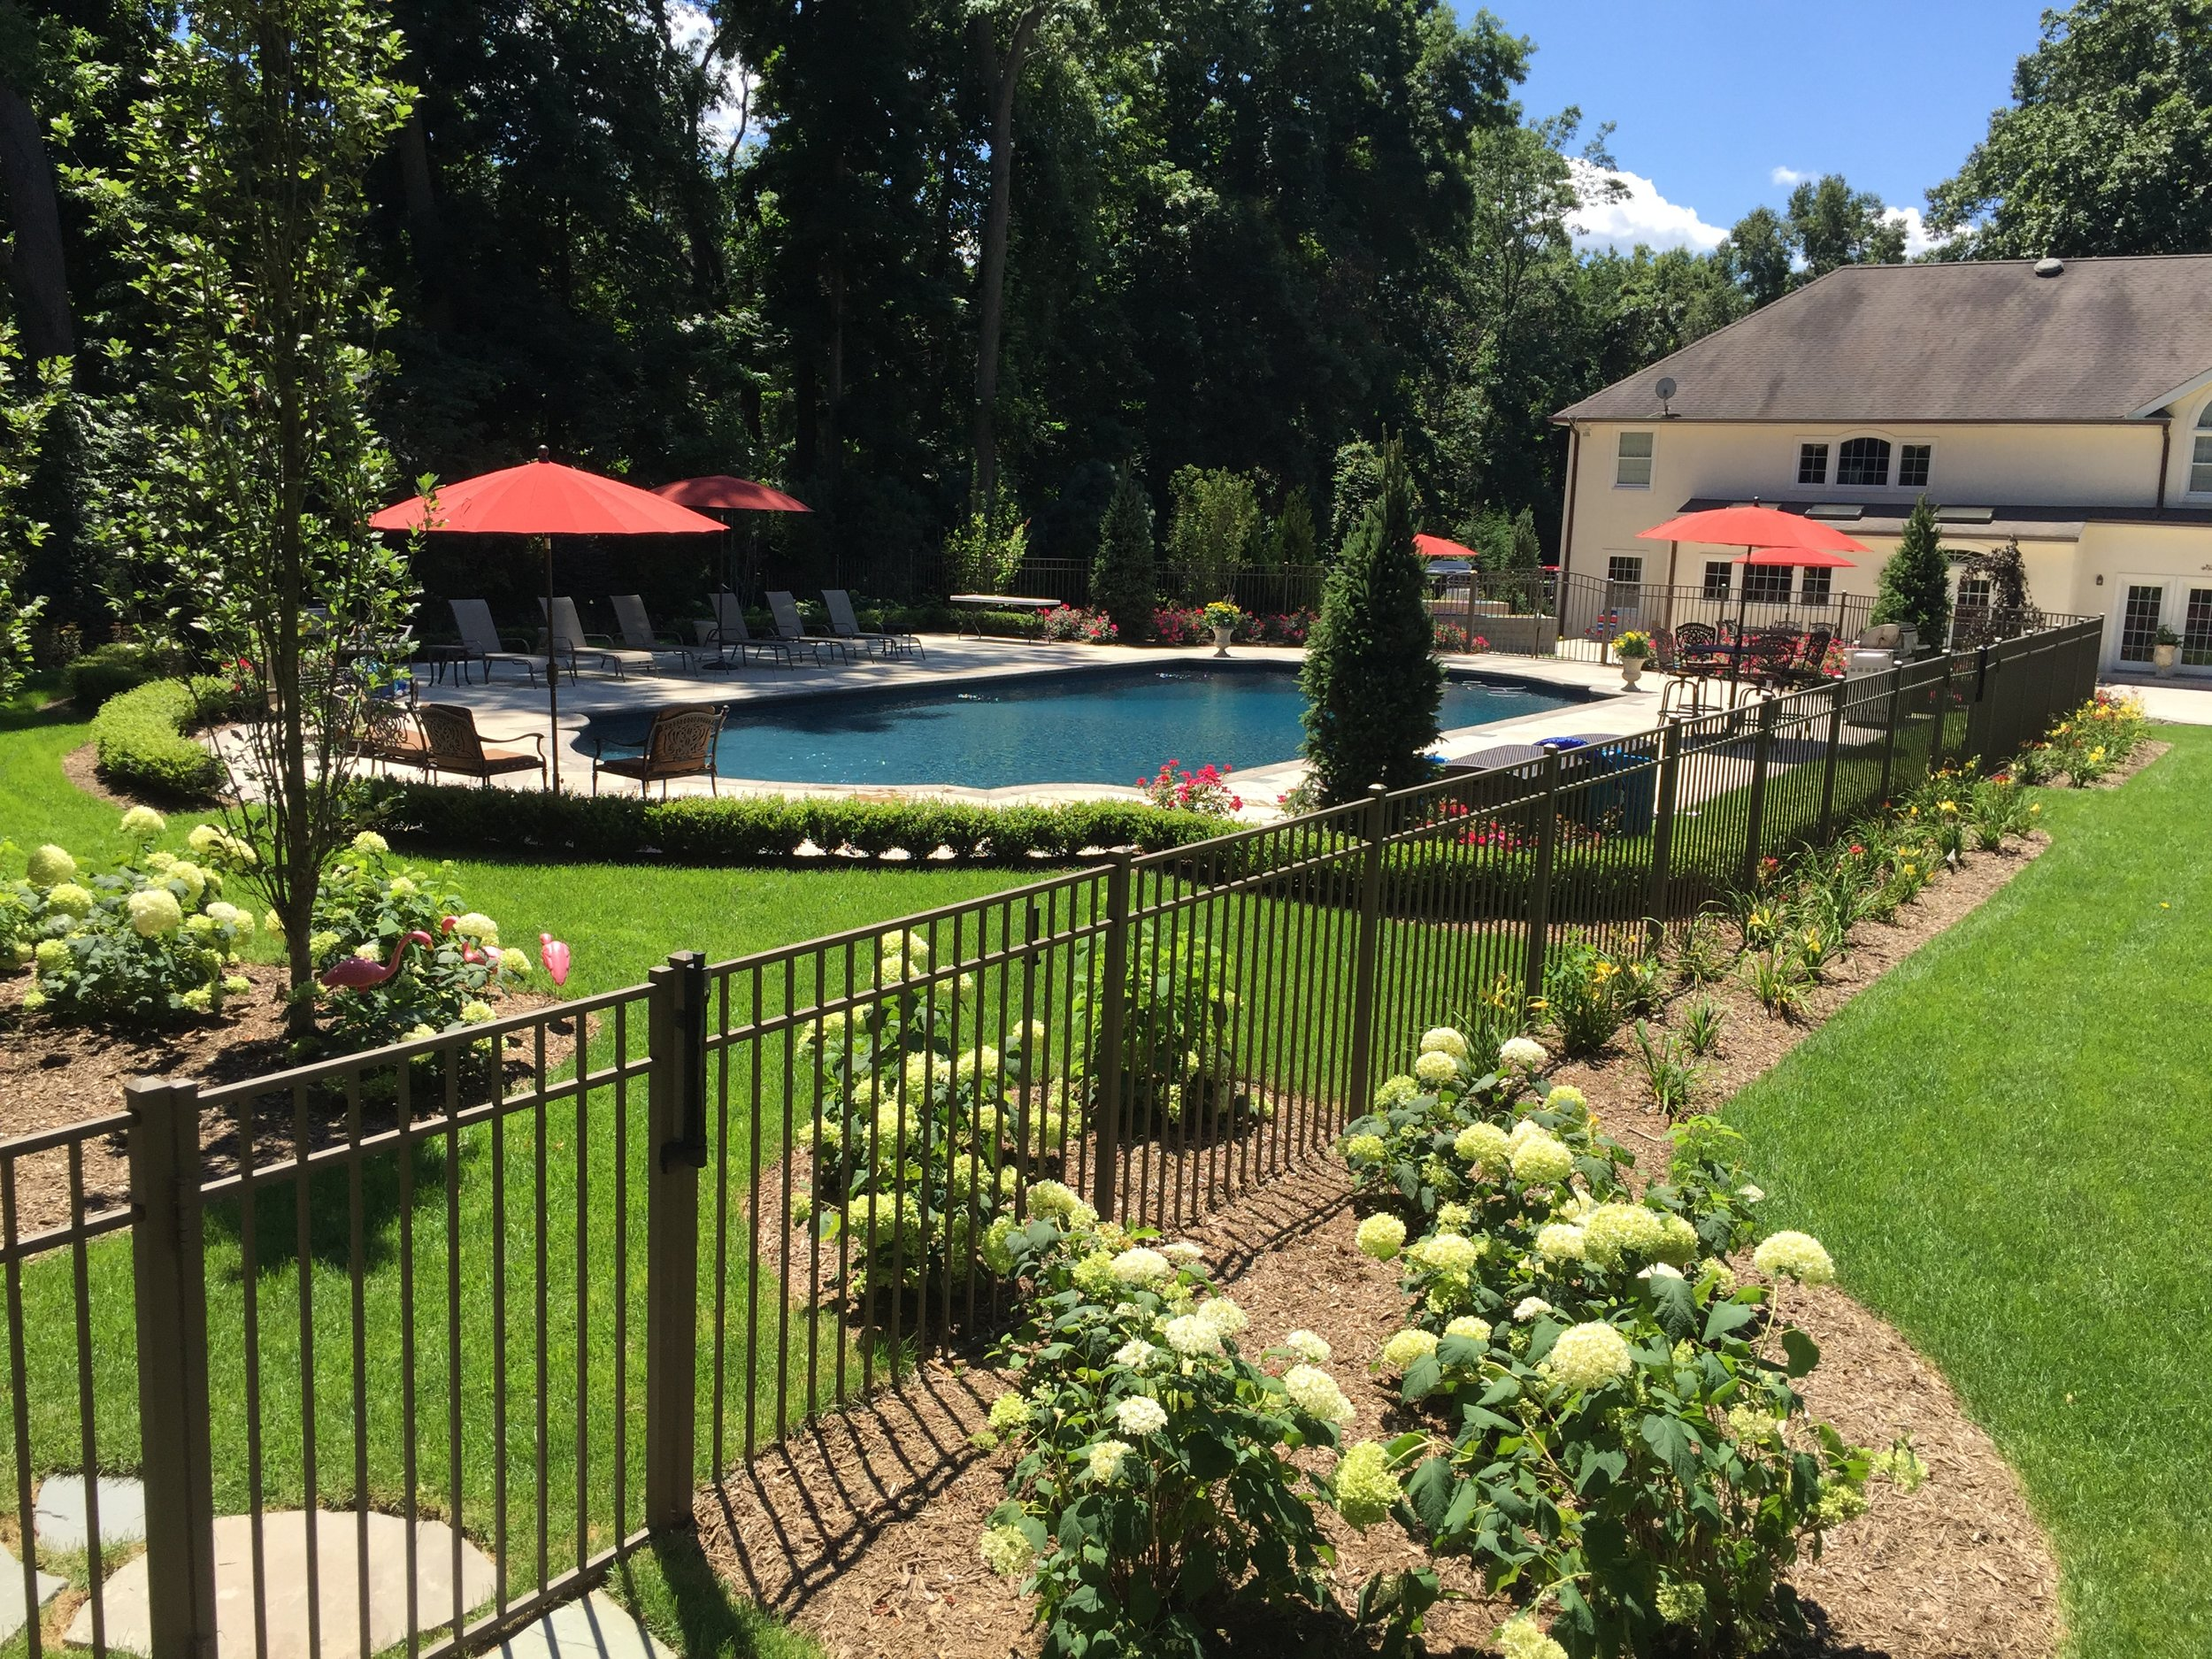 Professional aluminum fence landscape design company in Long Island, NY